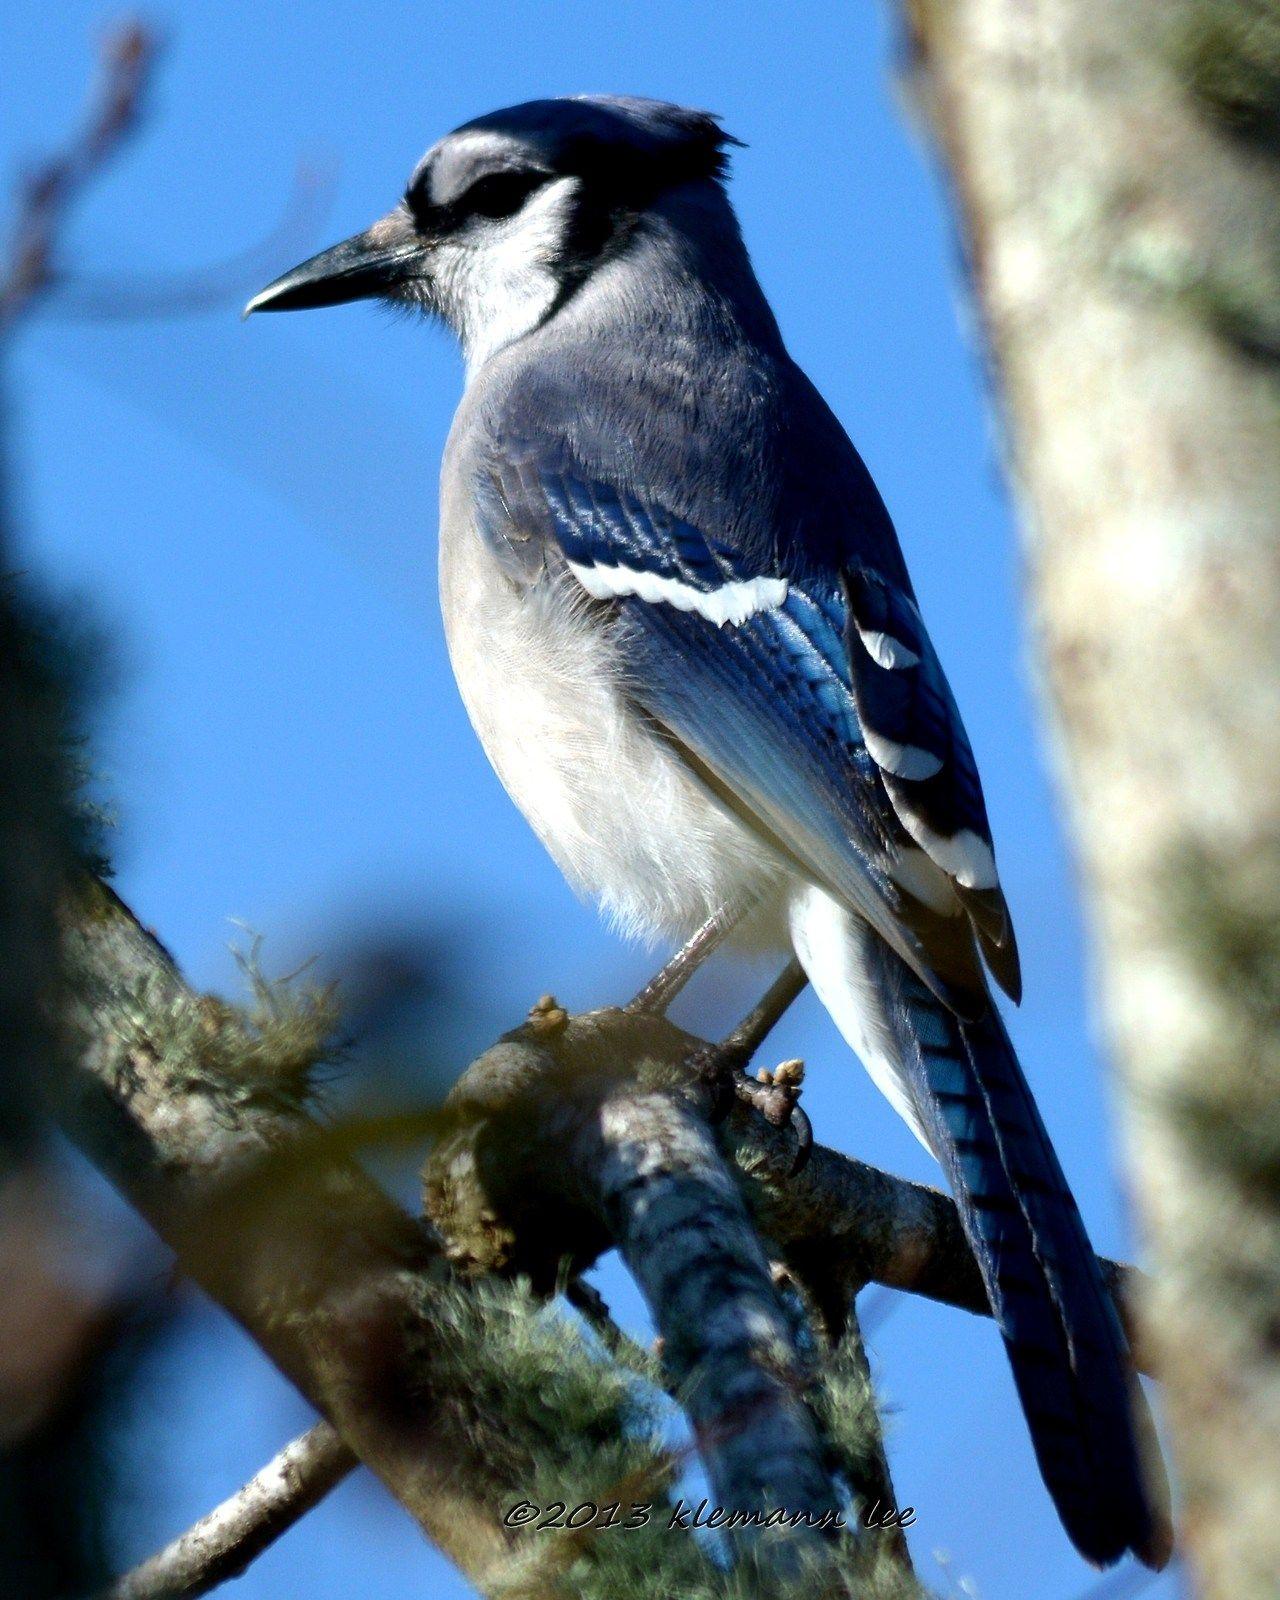 Blue Jay - Portrait day